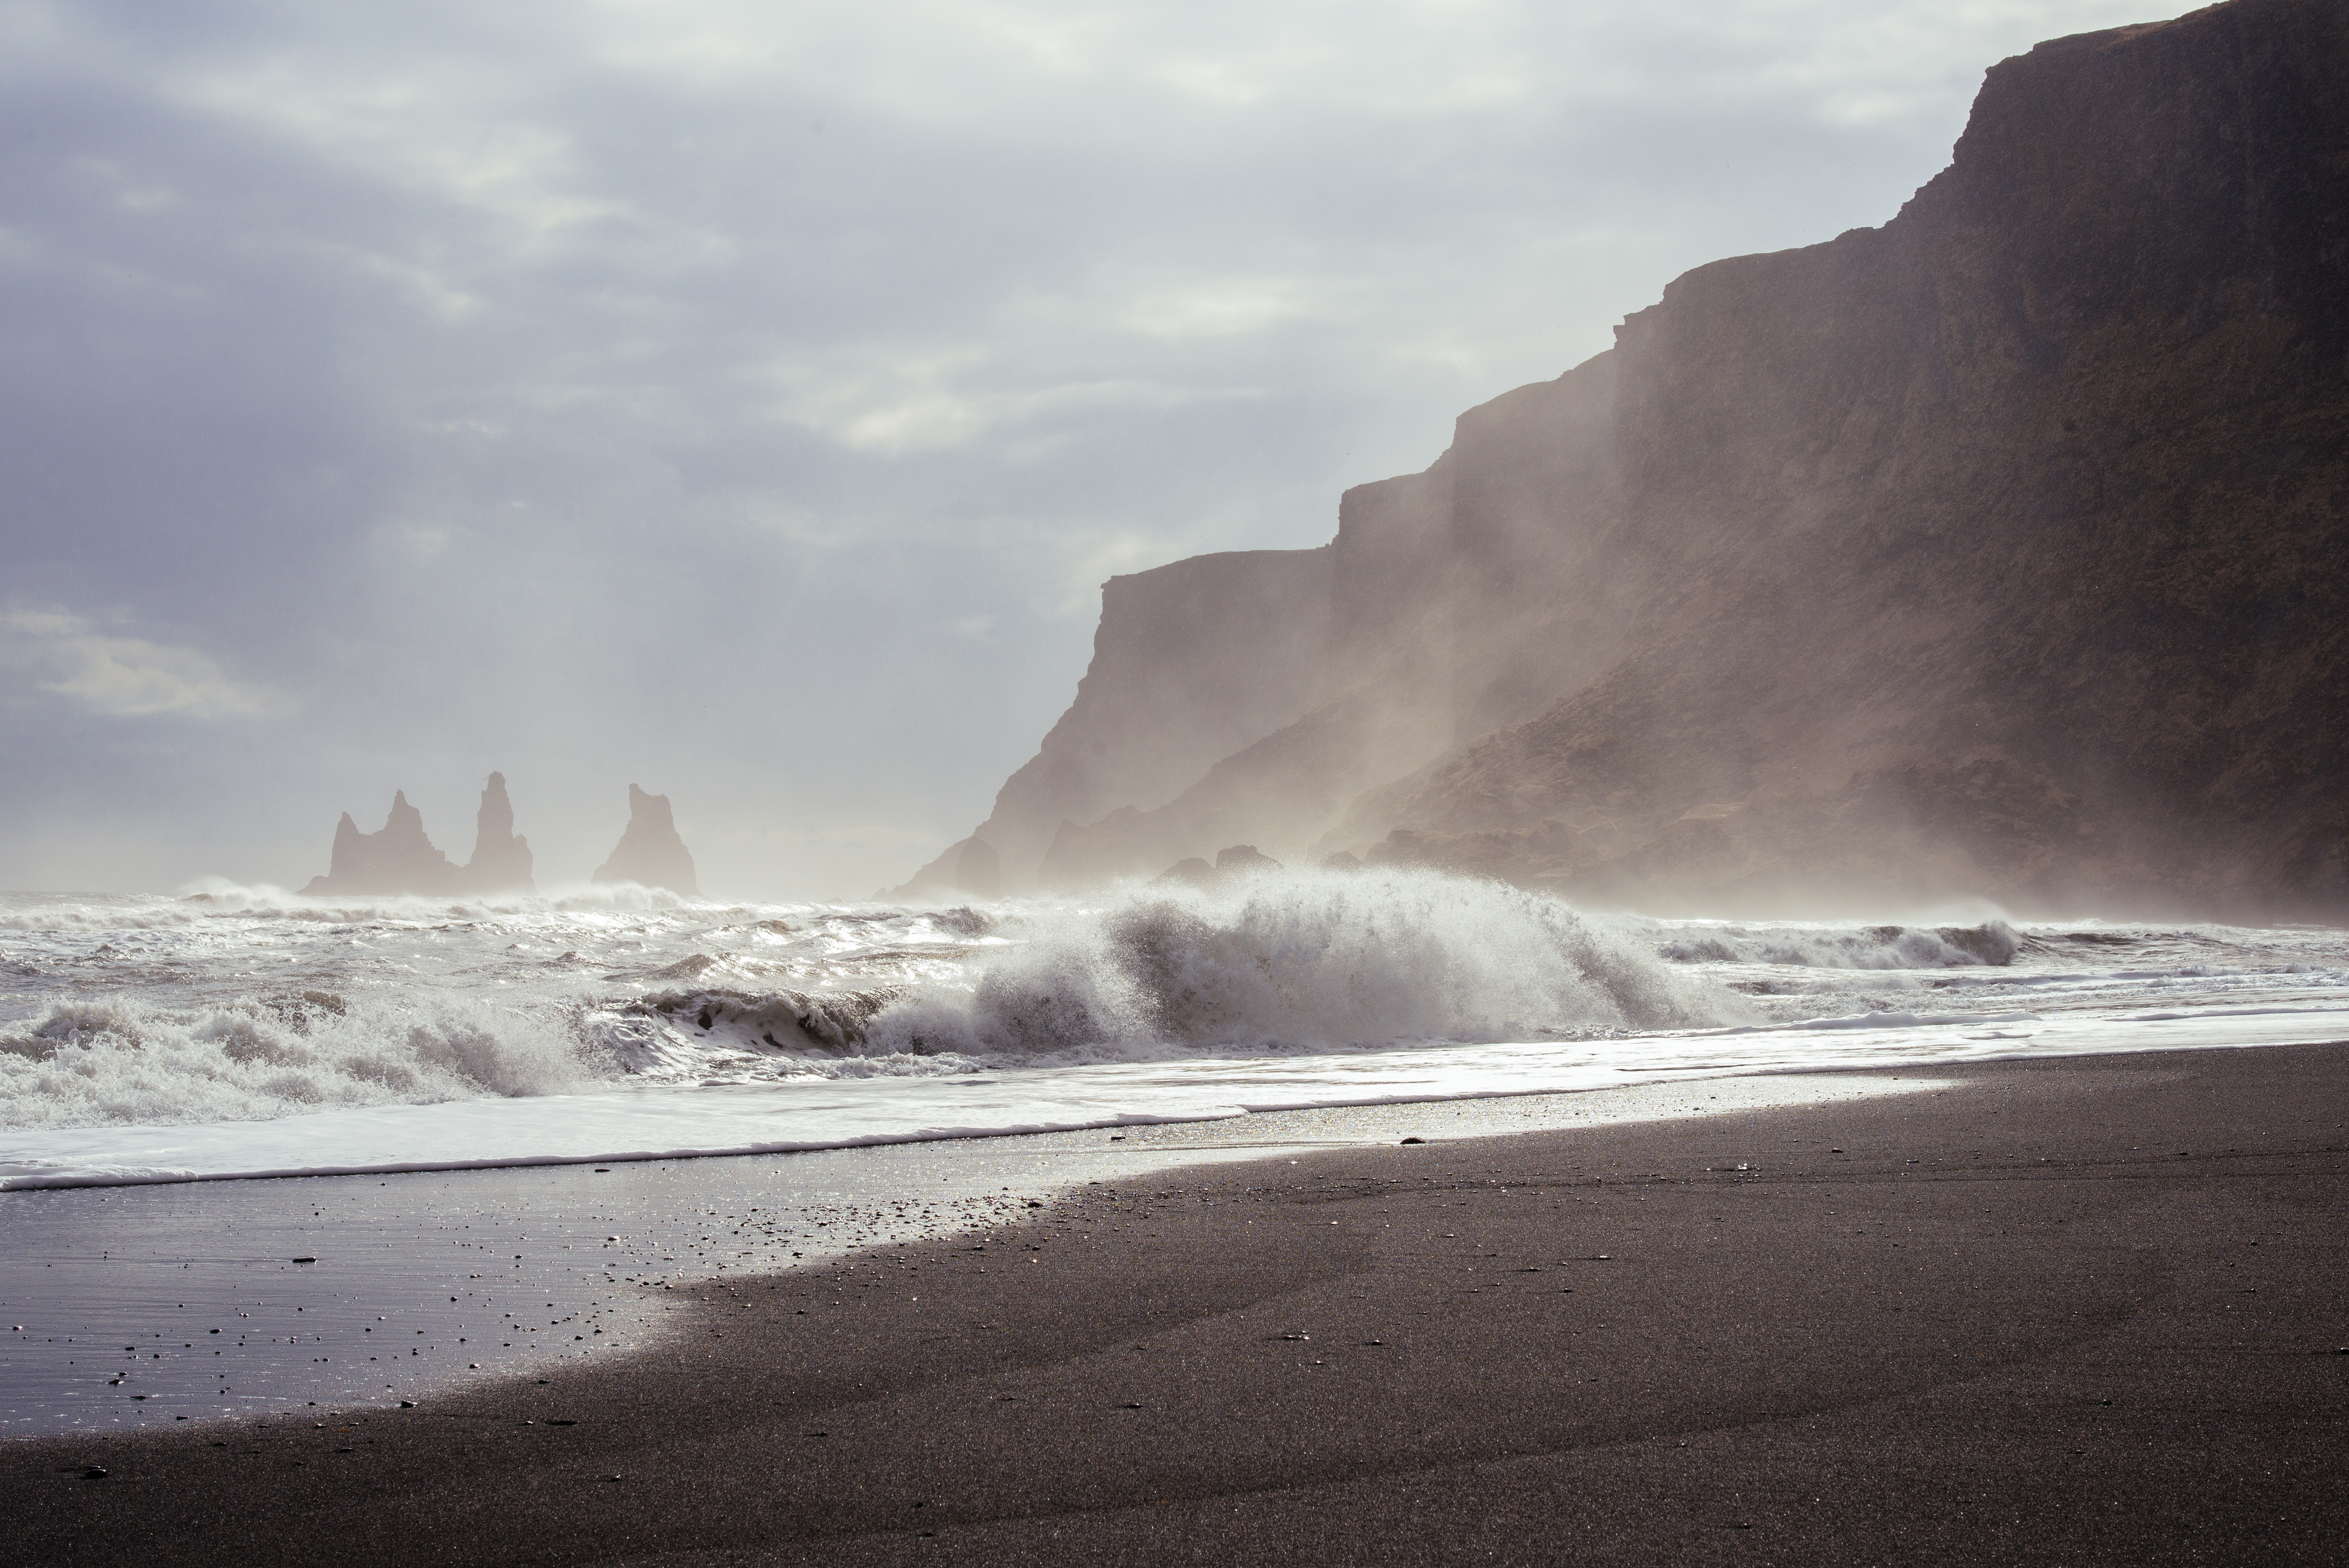 sea-nature-beach-ocean